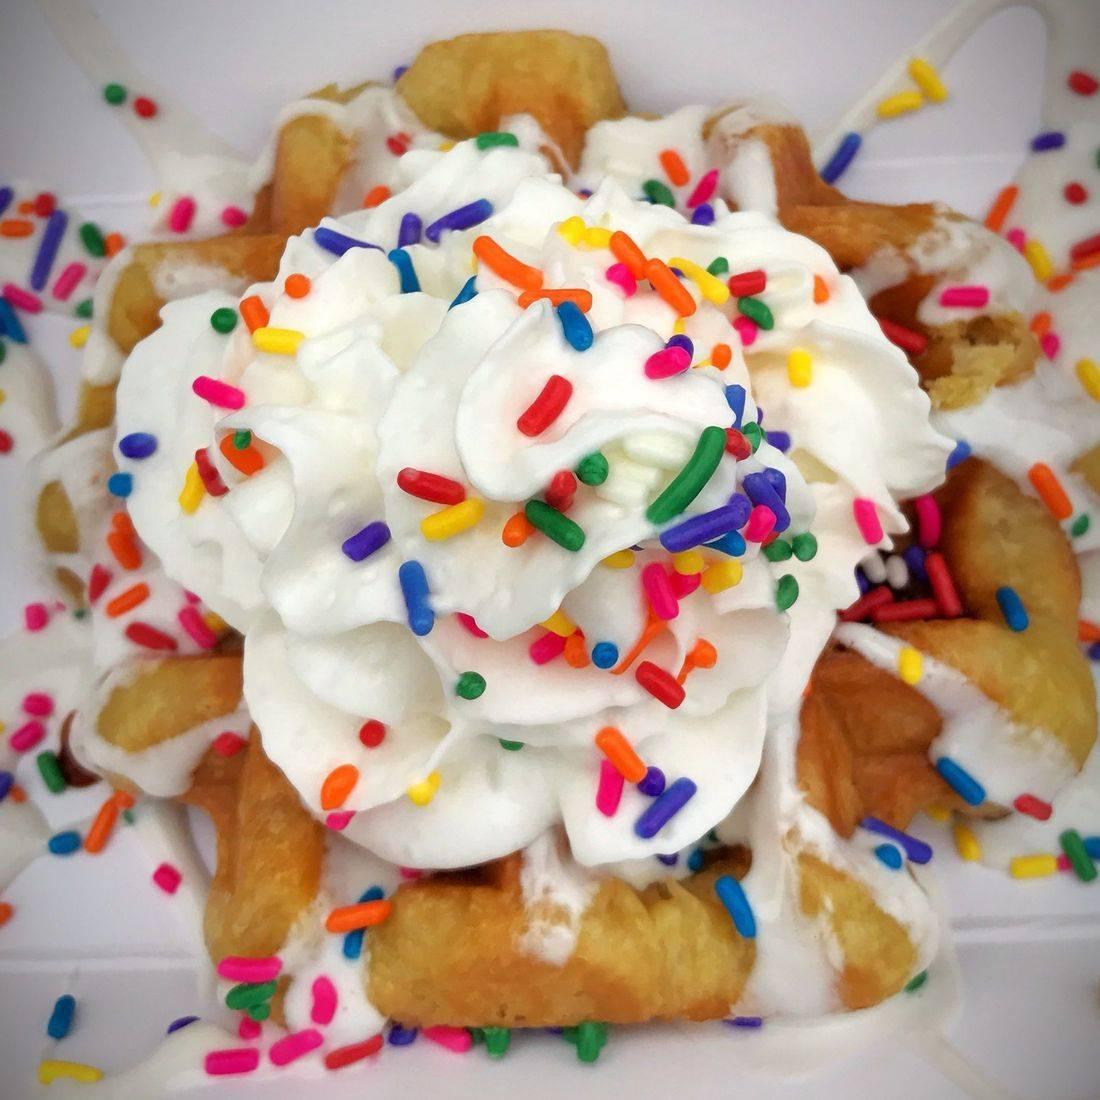 dessert_gourmet_waffles_fundraising_inland_empire_jpg